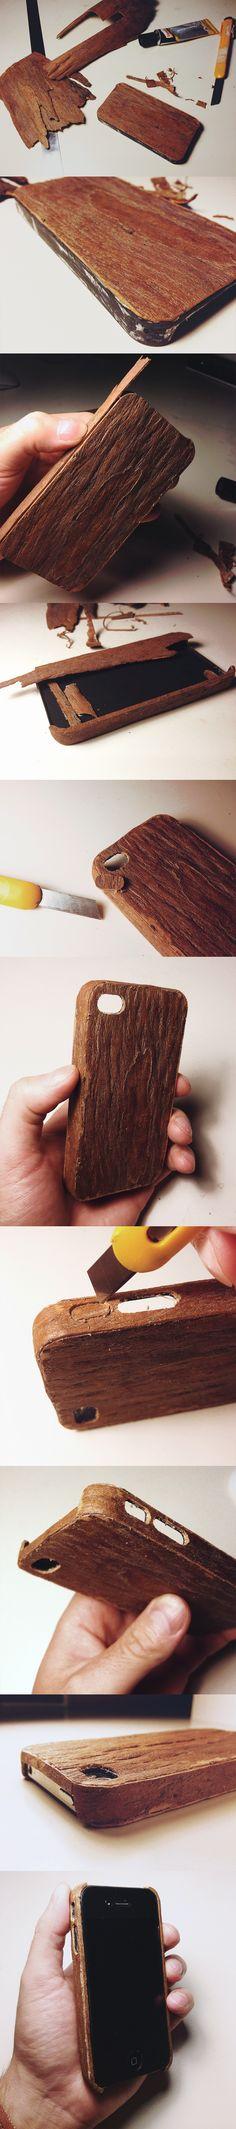 handmade wood case from used plastic case by Igor_Eezo